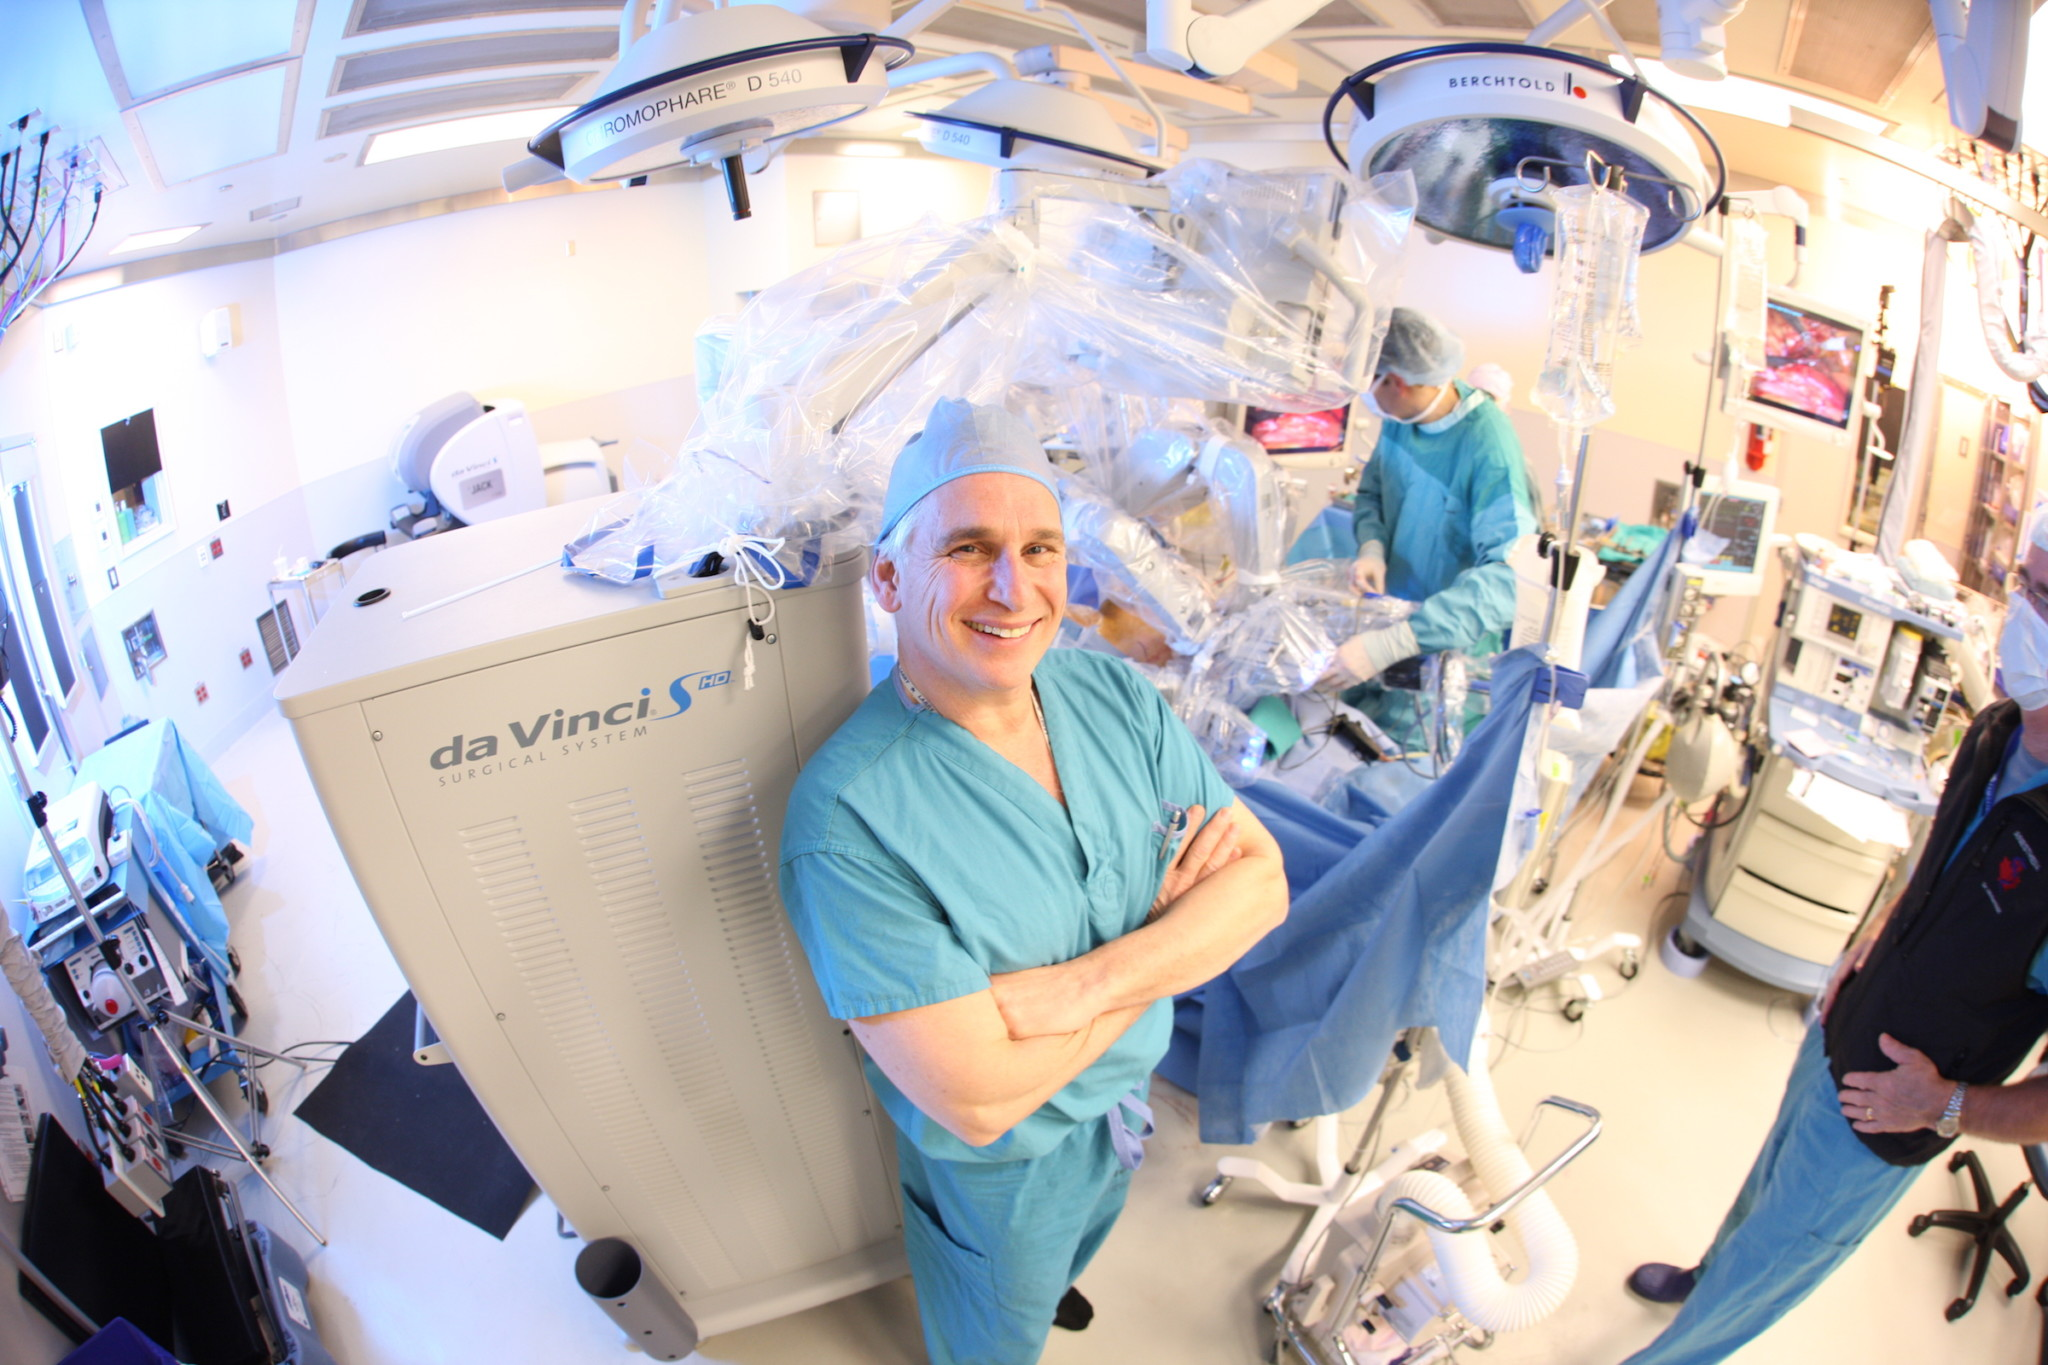 VGH & UBC HOSPITAL FOUNDATION ANNOUNCES URGENT FUNDING NEED FOR VITAL EQUIPMENT